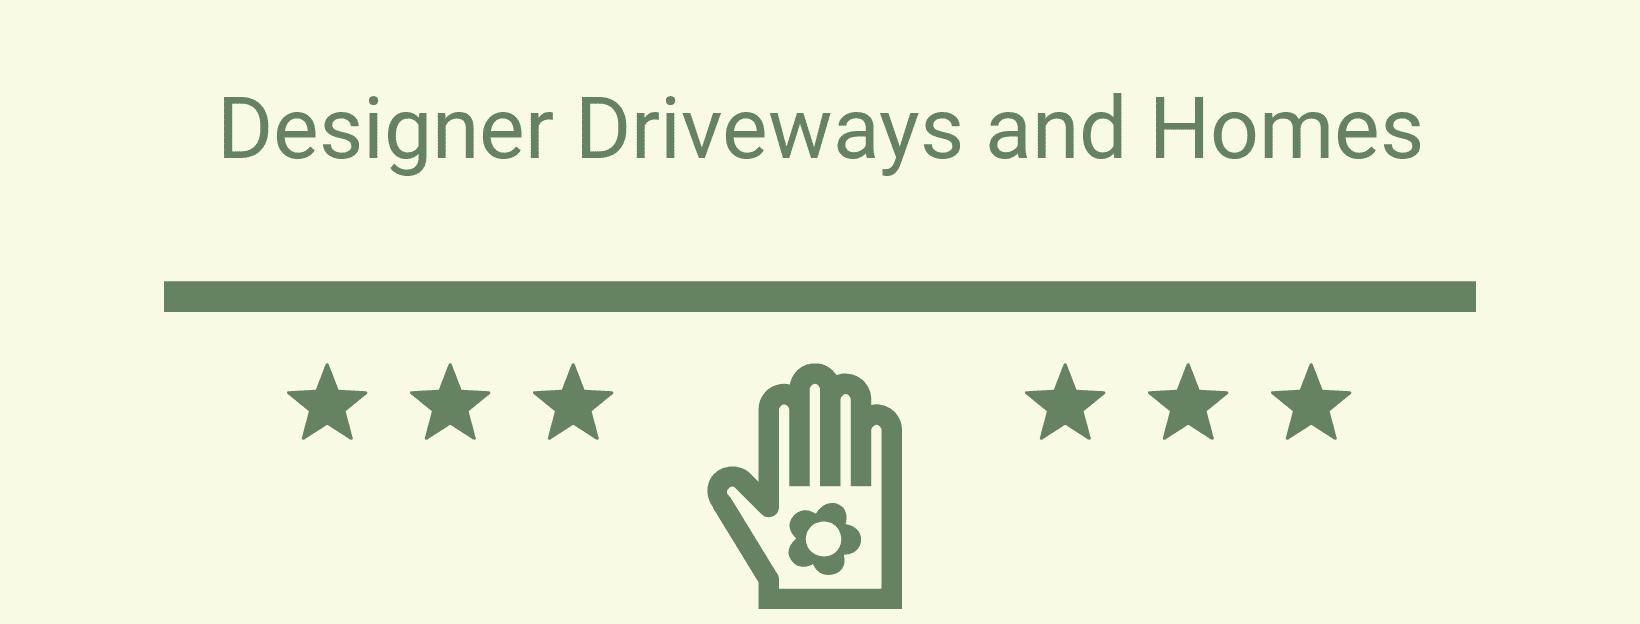 Designer Driveway Advertisements